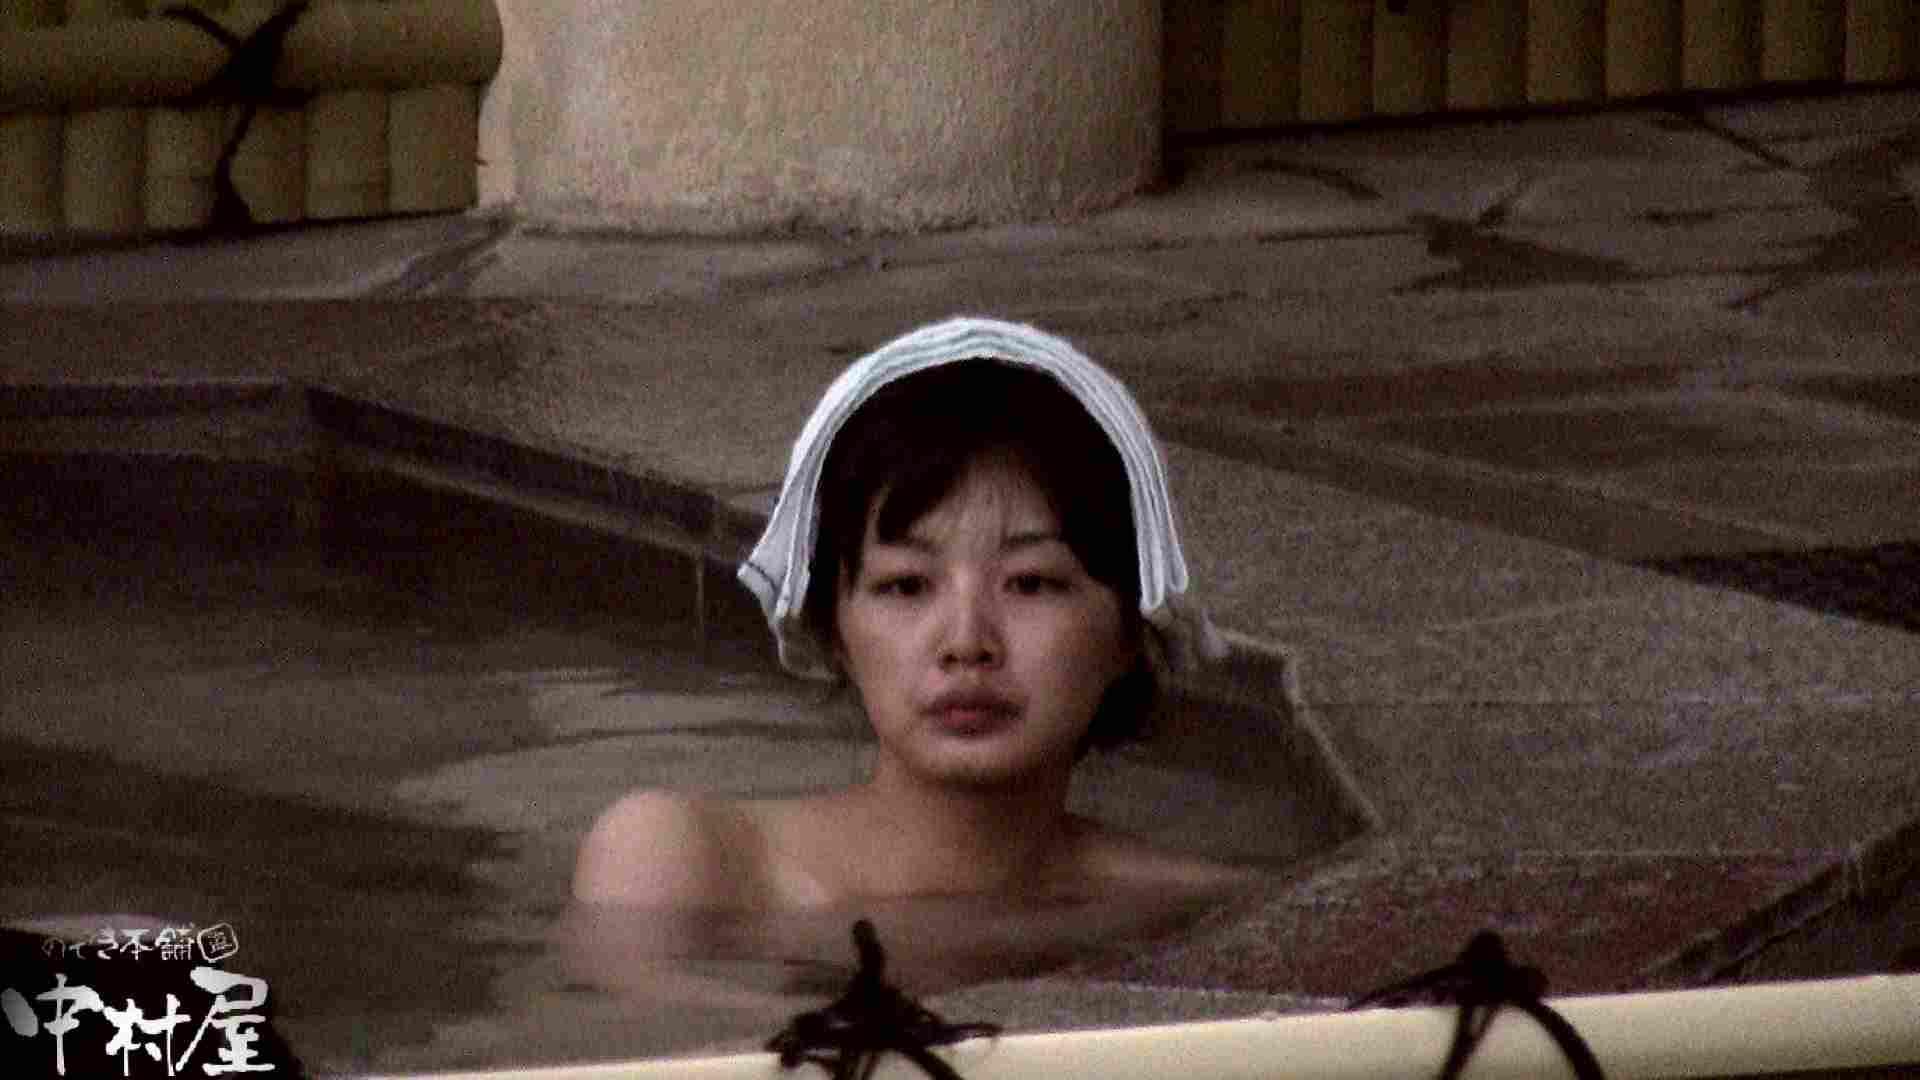 Aquaな露天風呂Vol.916 いやらしいOL | 0  75連発 33